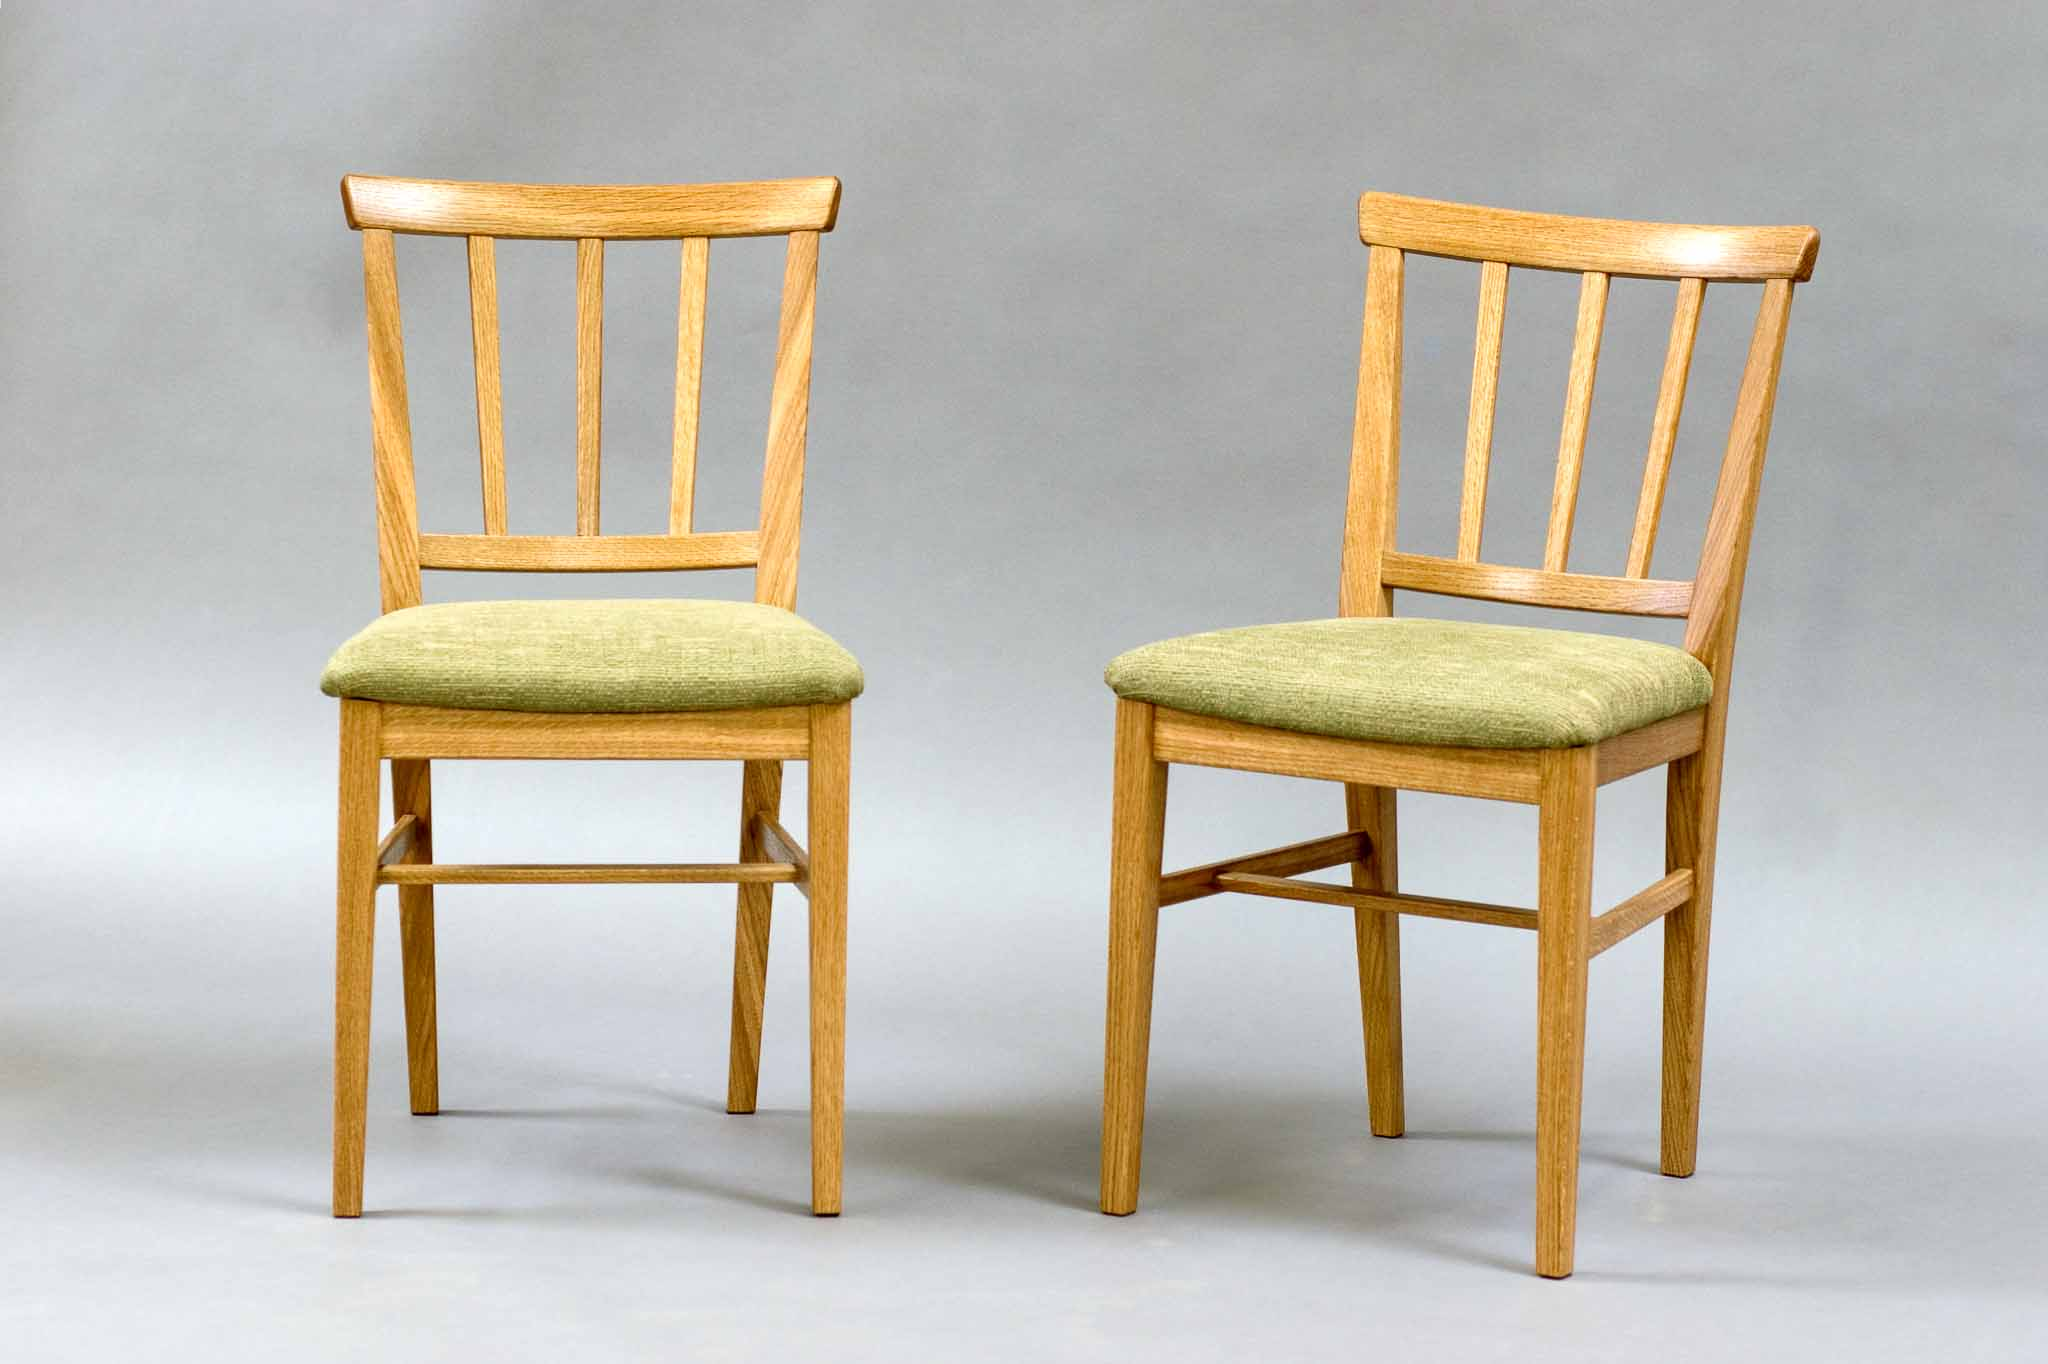 Malmsten chairs